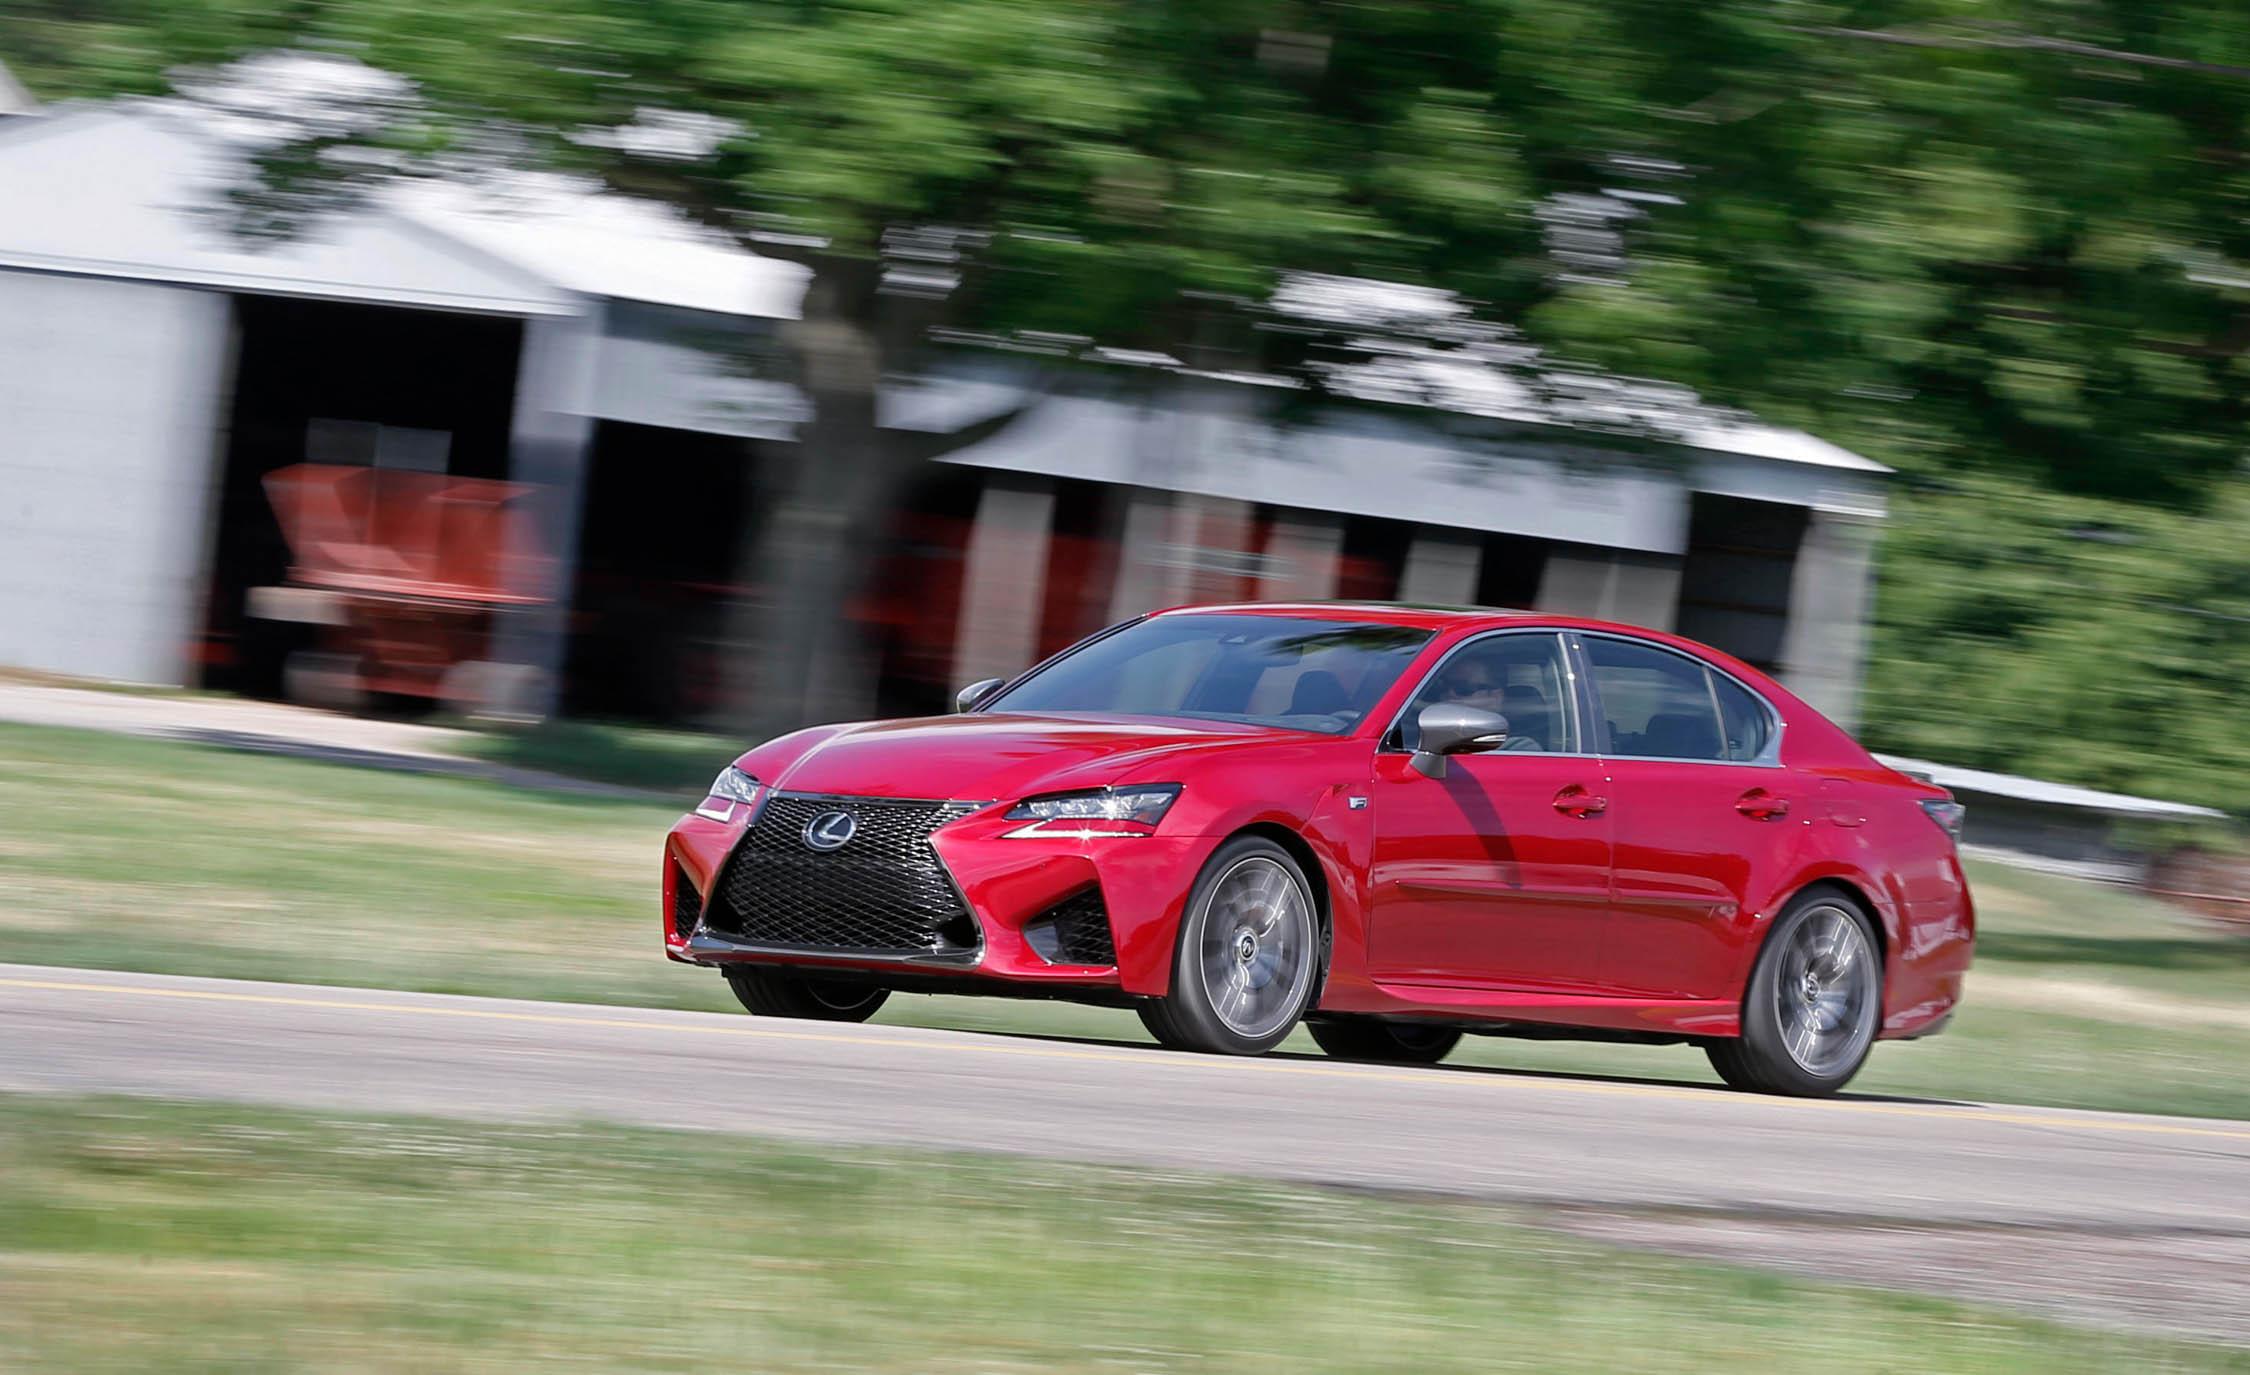 2016 Lexus Gs F Test Drive (Photo 13 of 20)